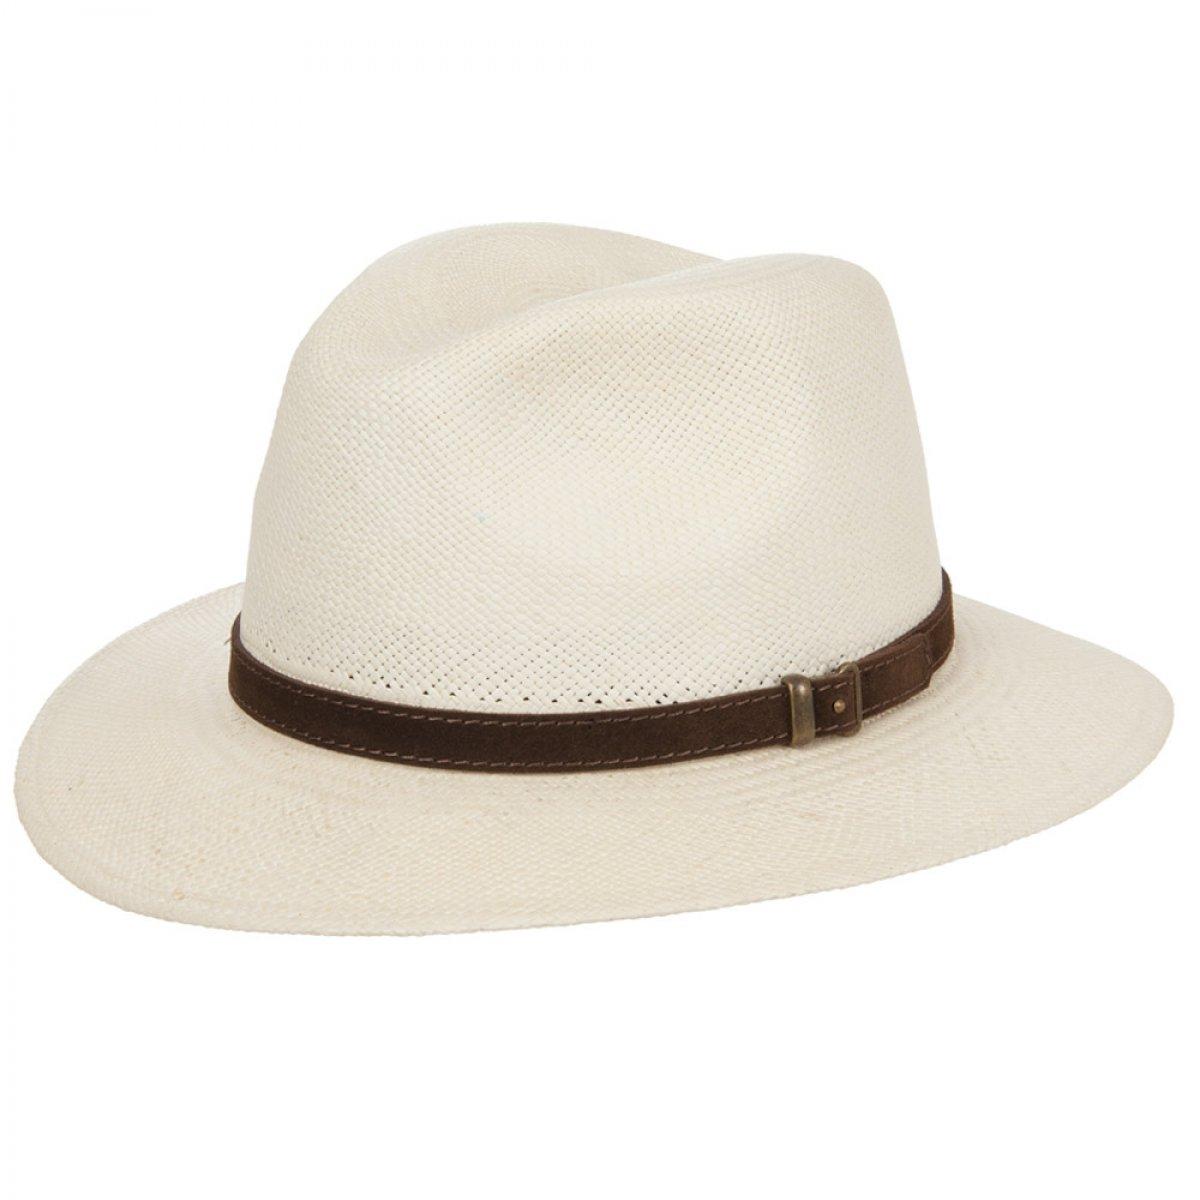 6521541931 cappello Panama cappello Panama